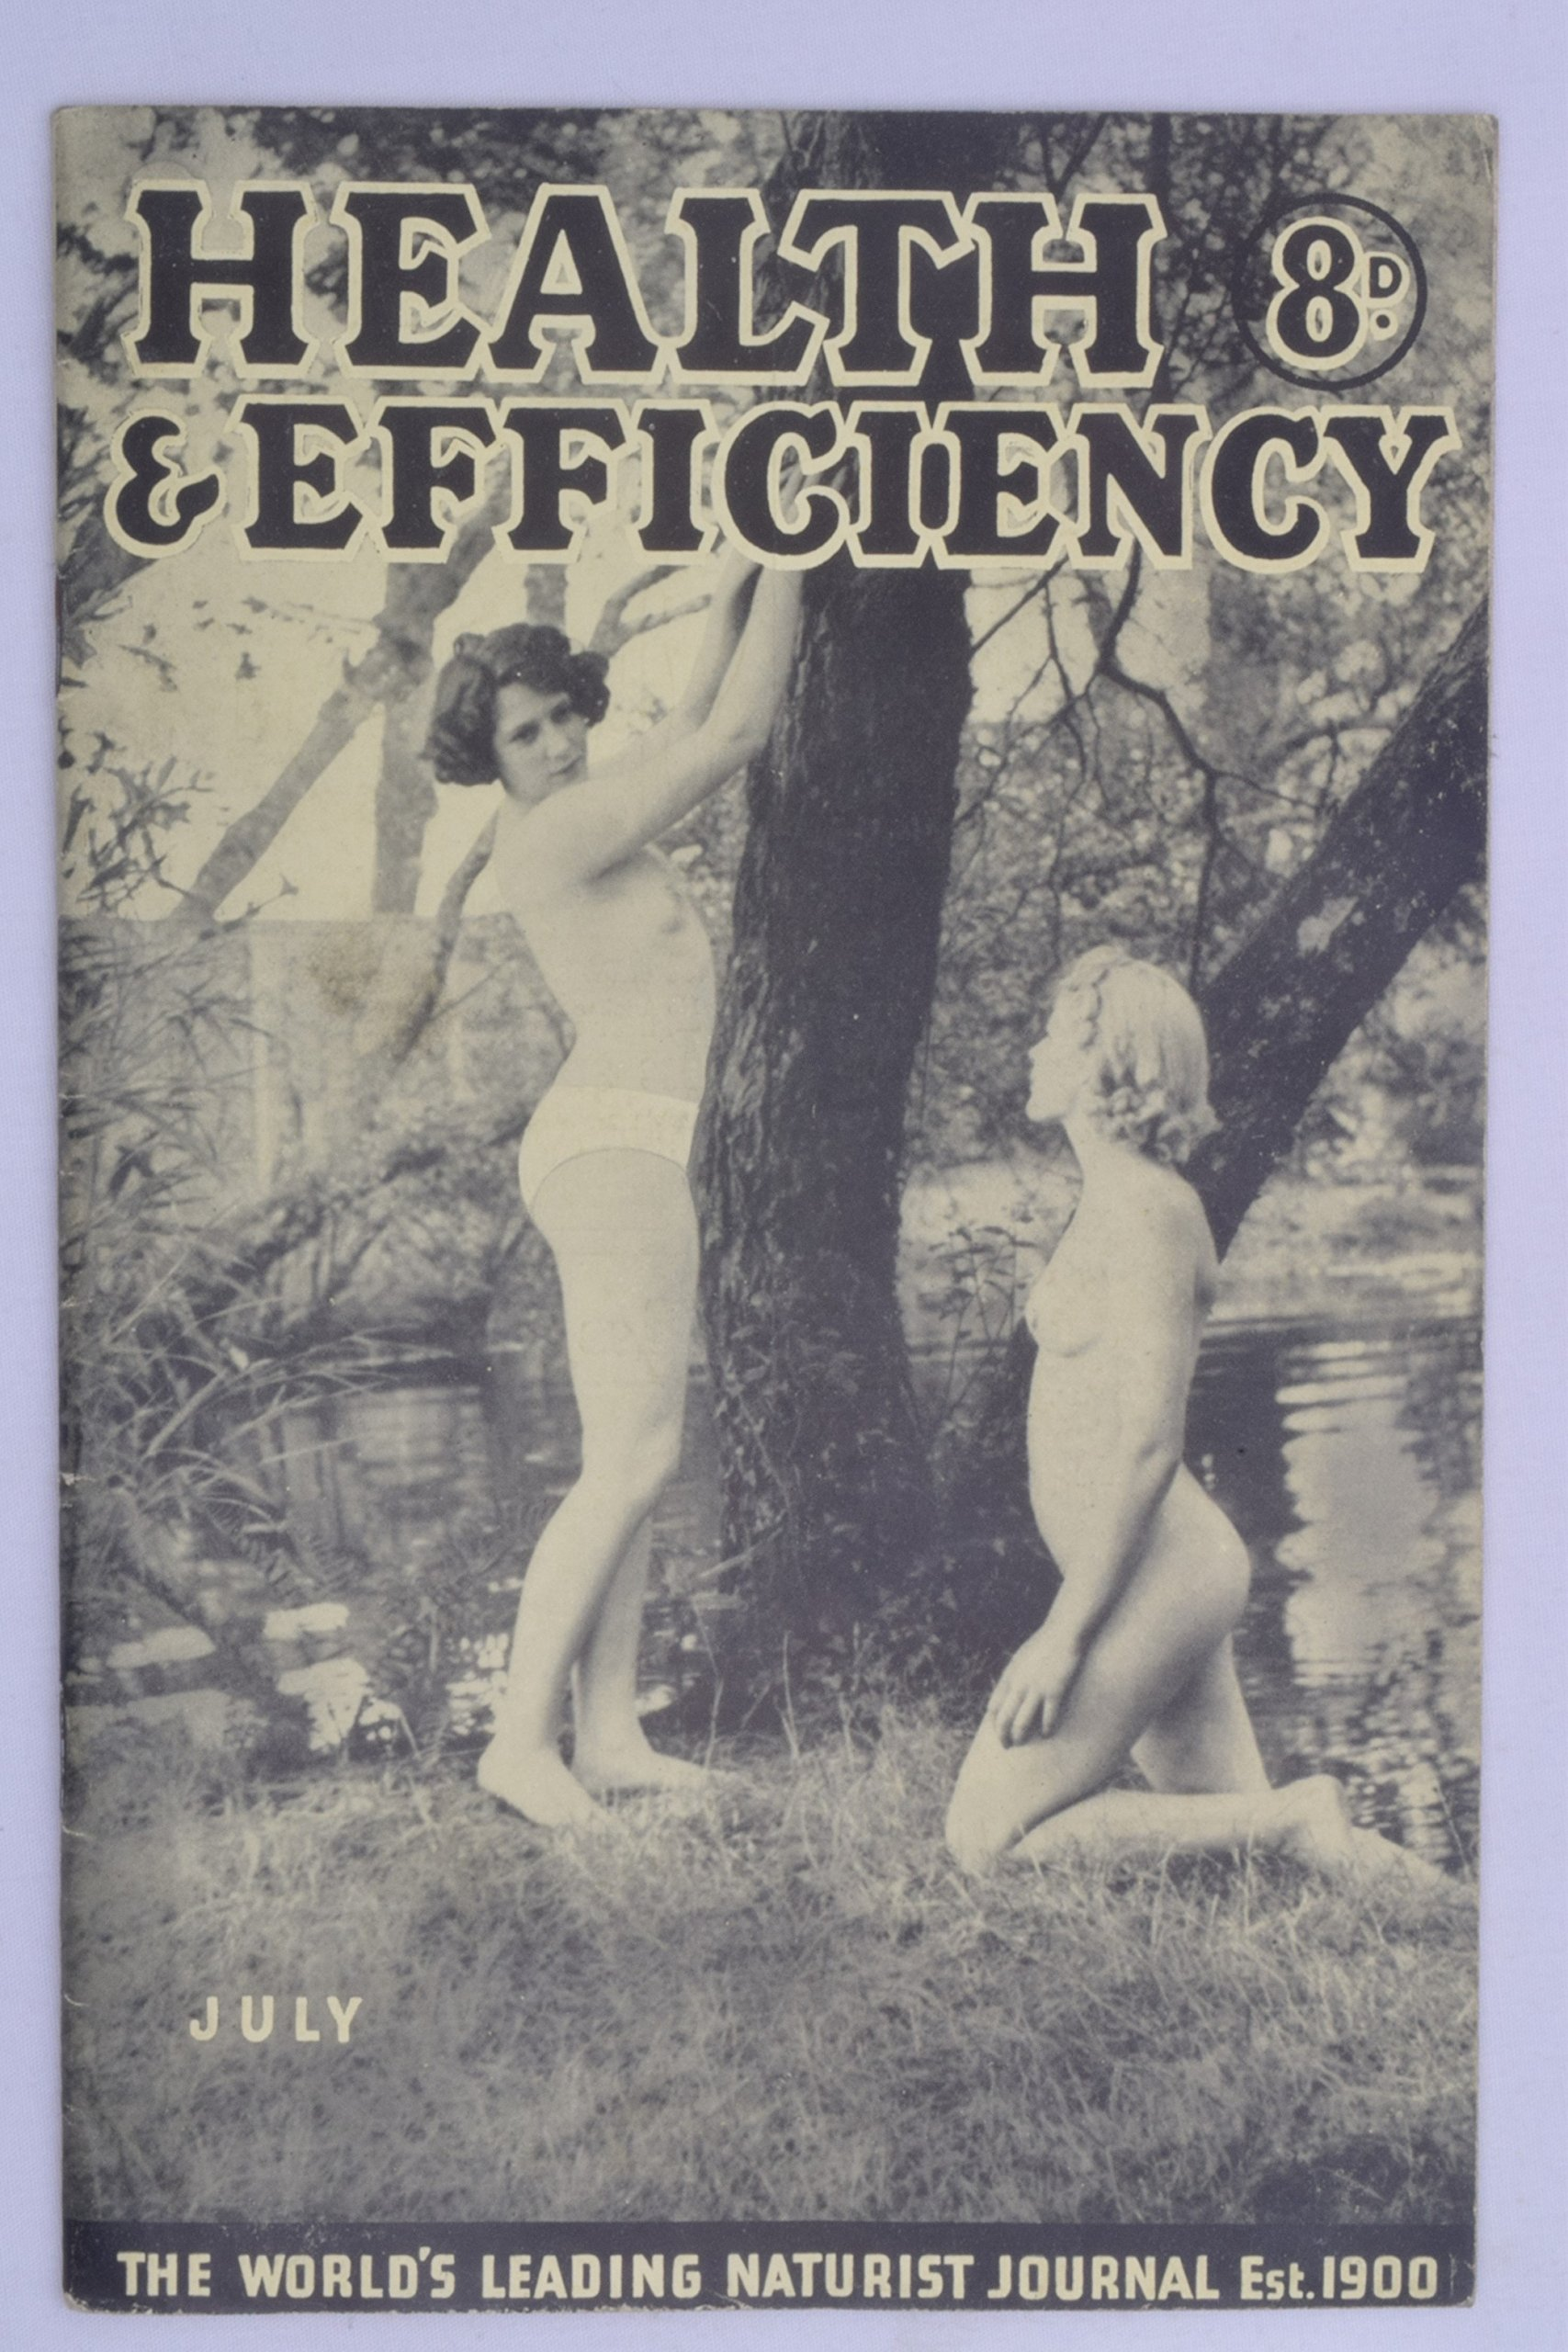 Retro nudist magazine think, that